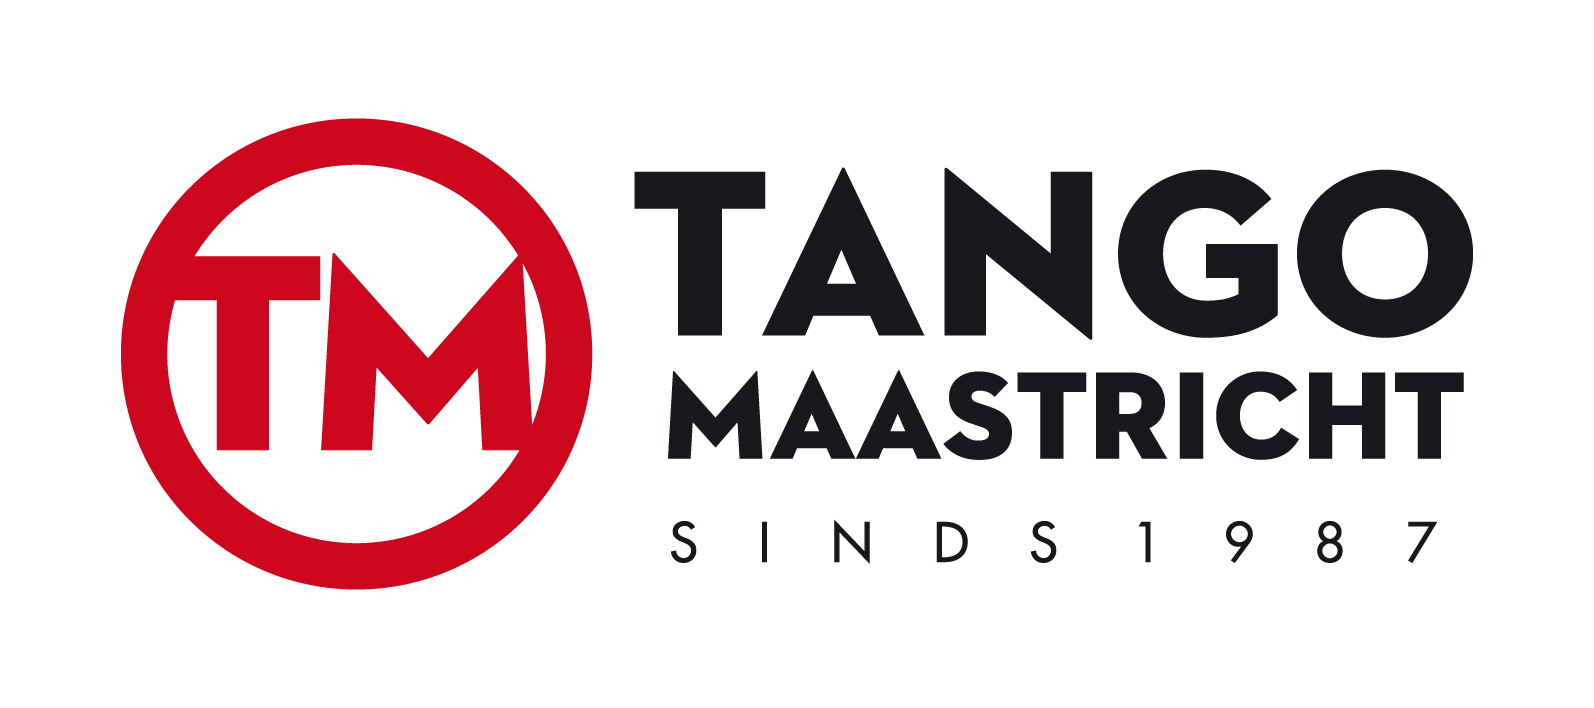 Tango Maastricht